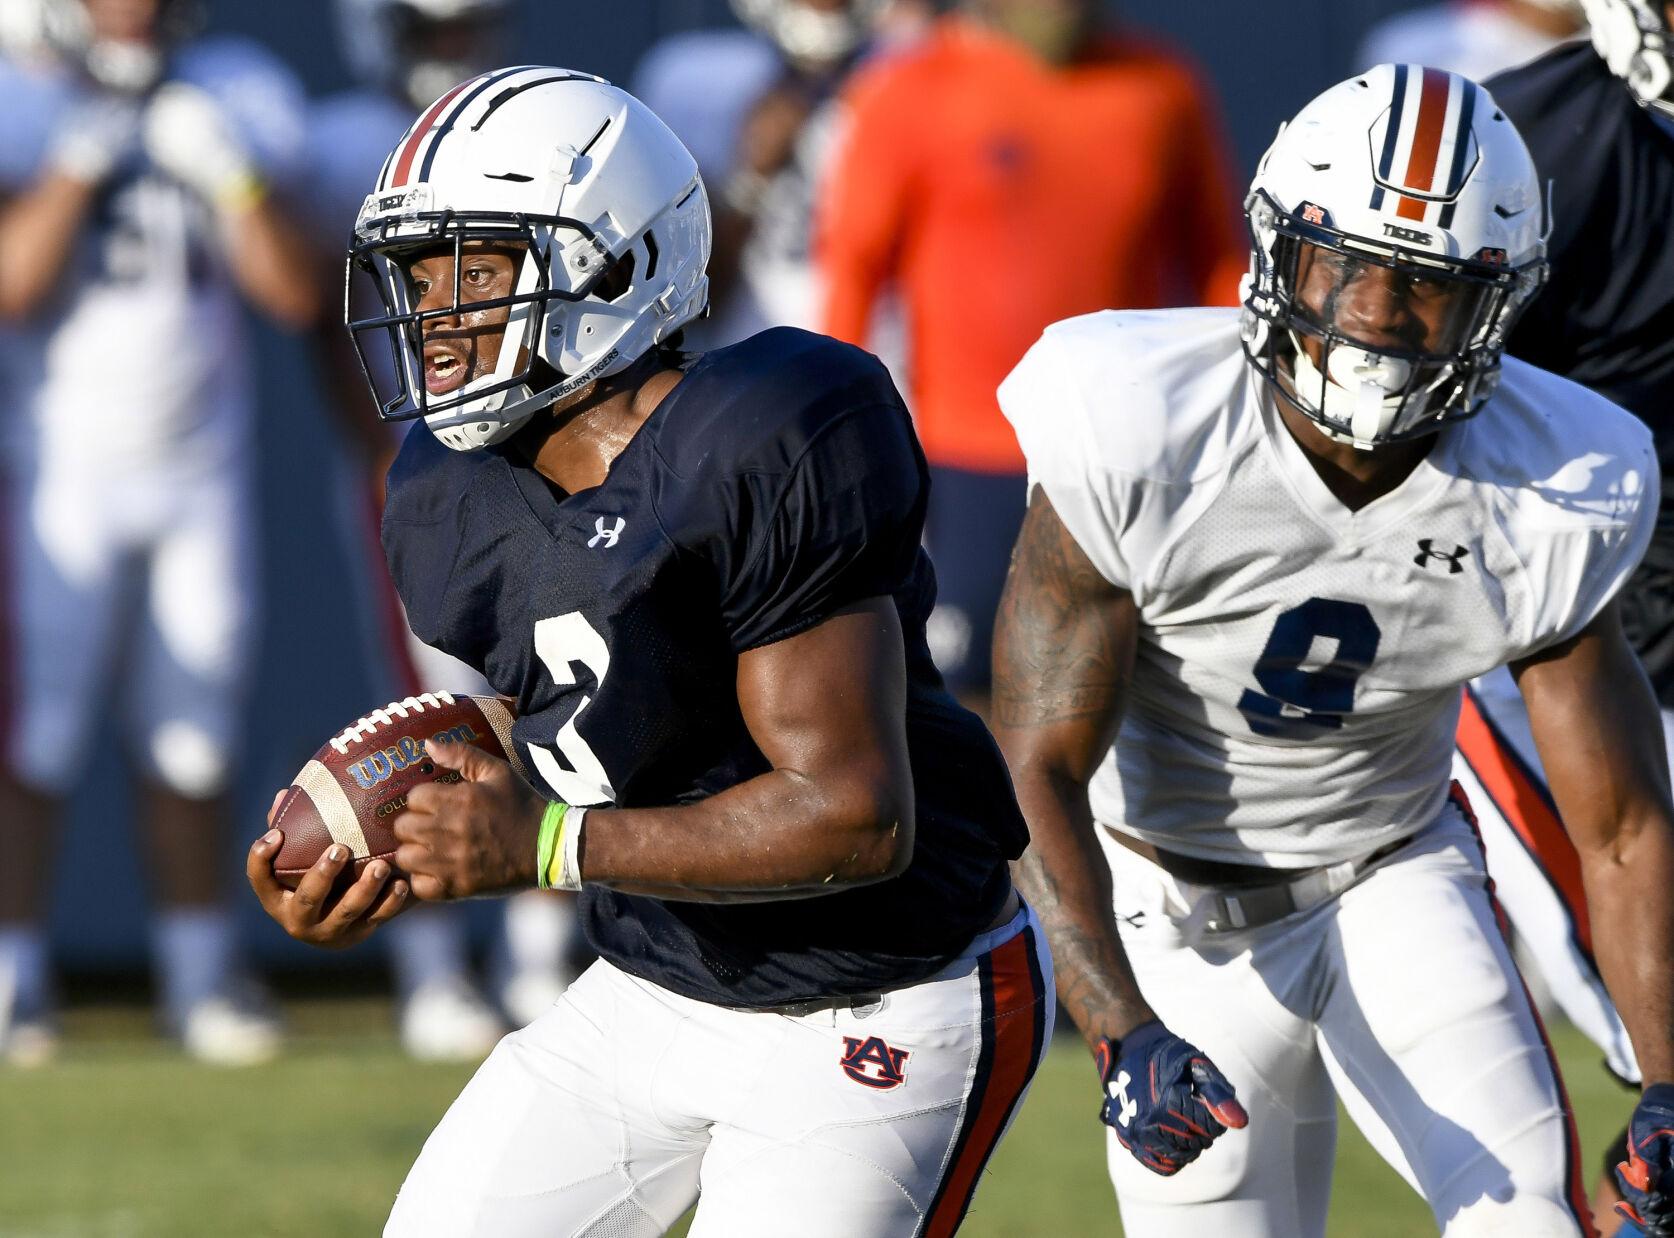 Auburn Football Working To Revamp Offense Sports Auburnvillager com